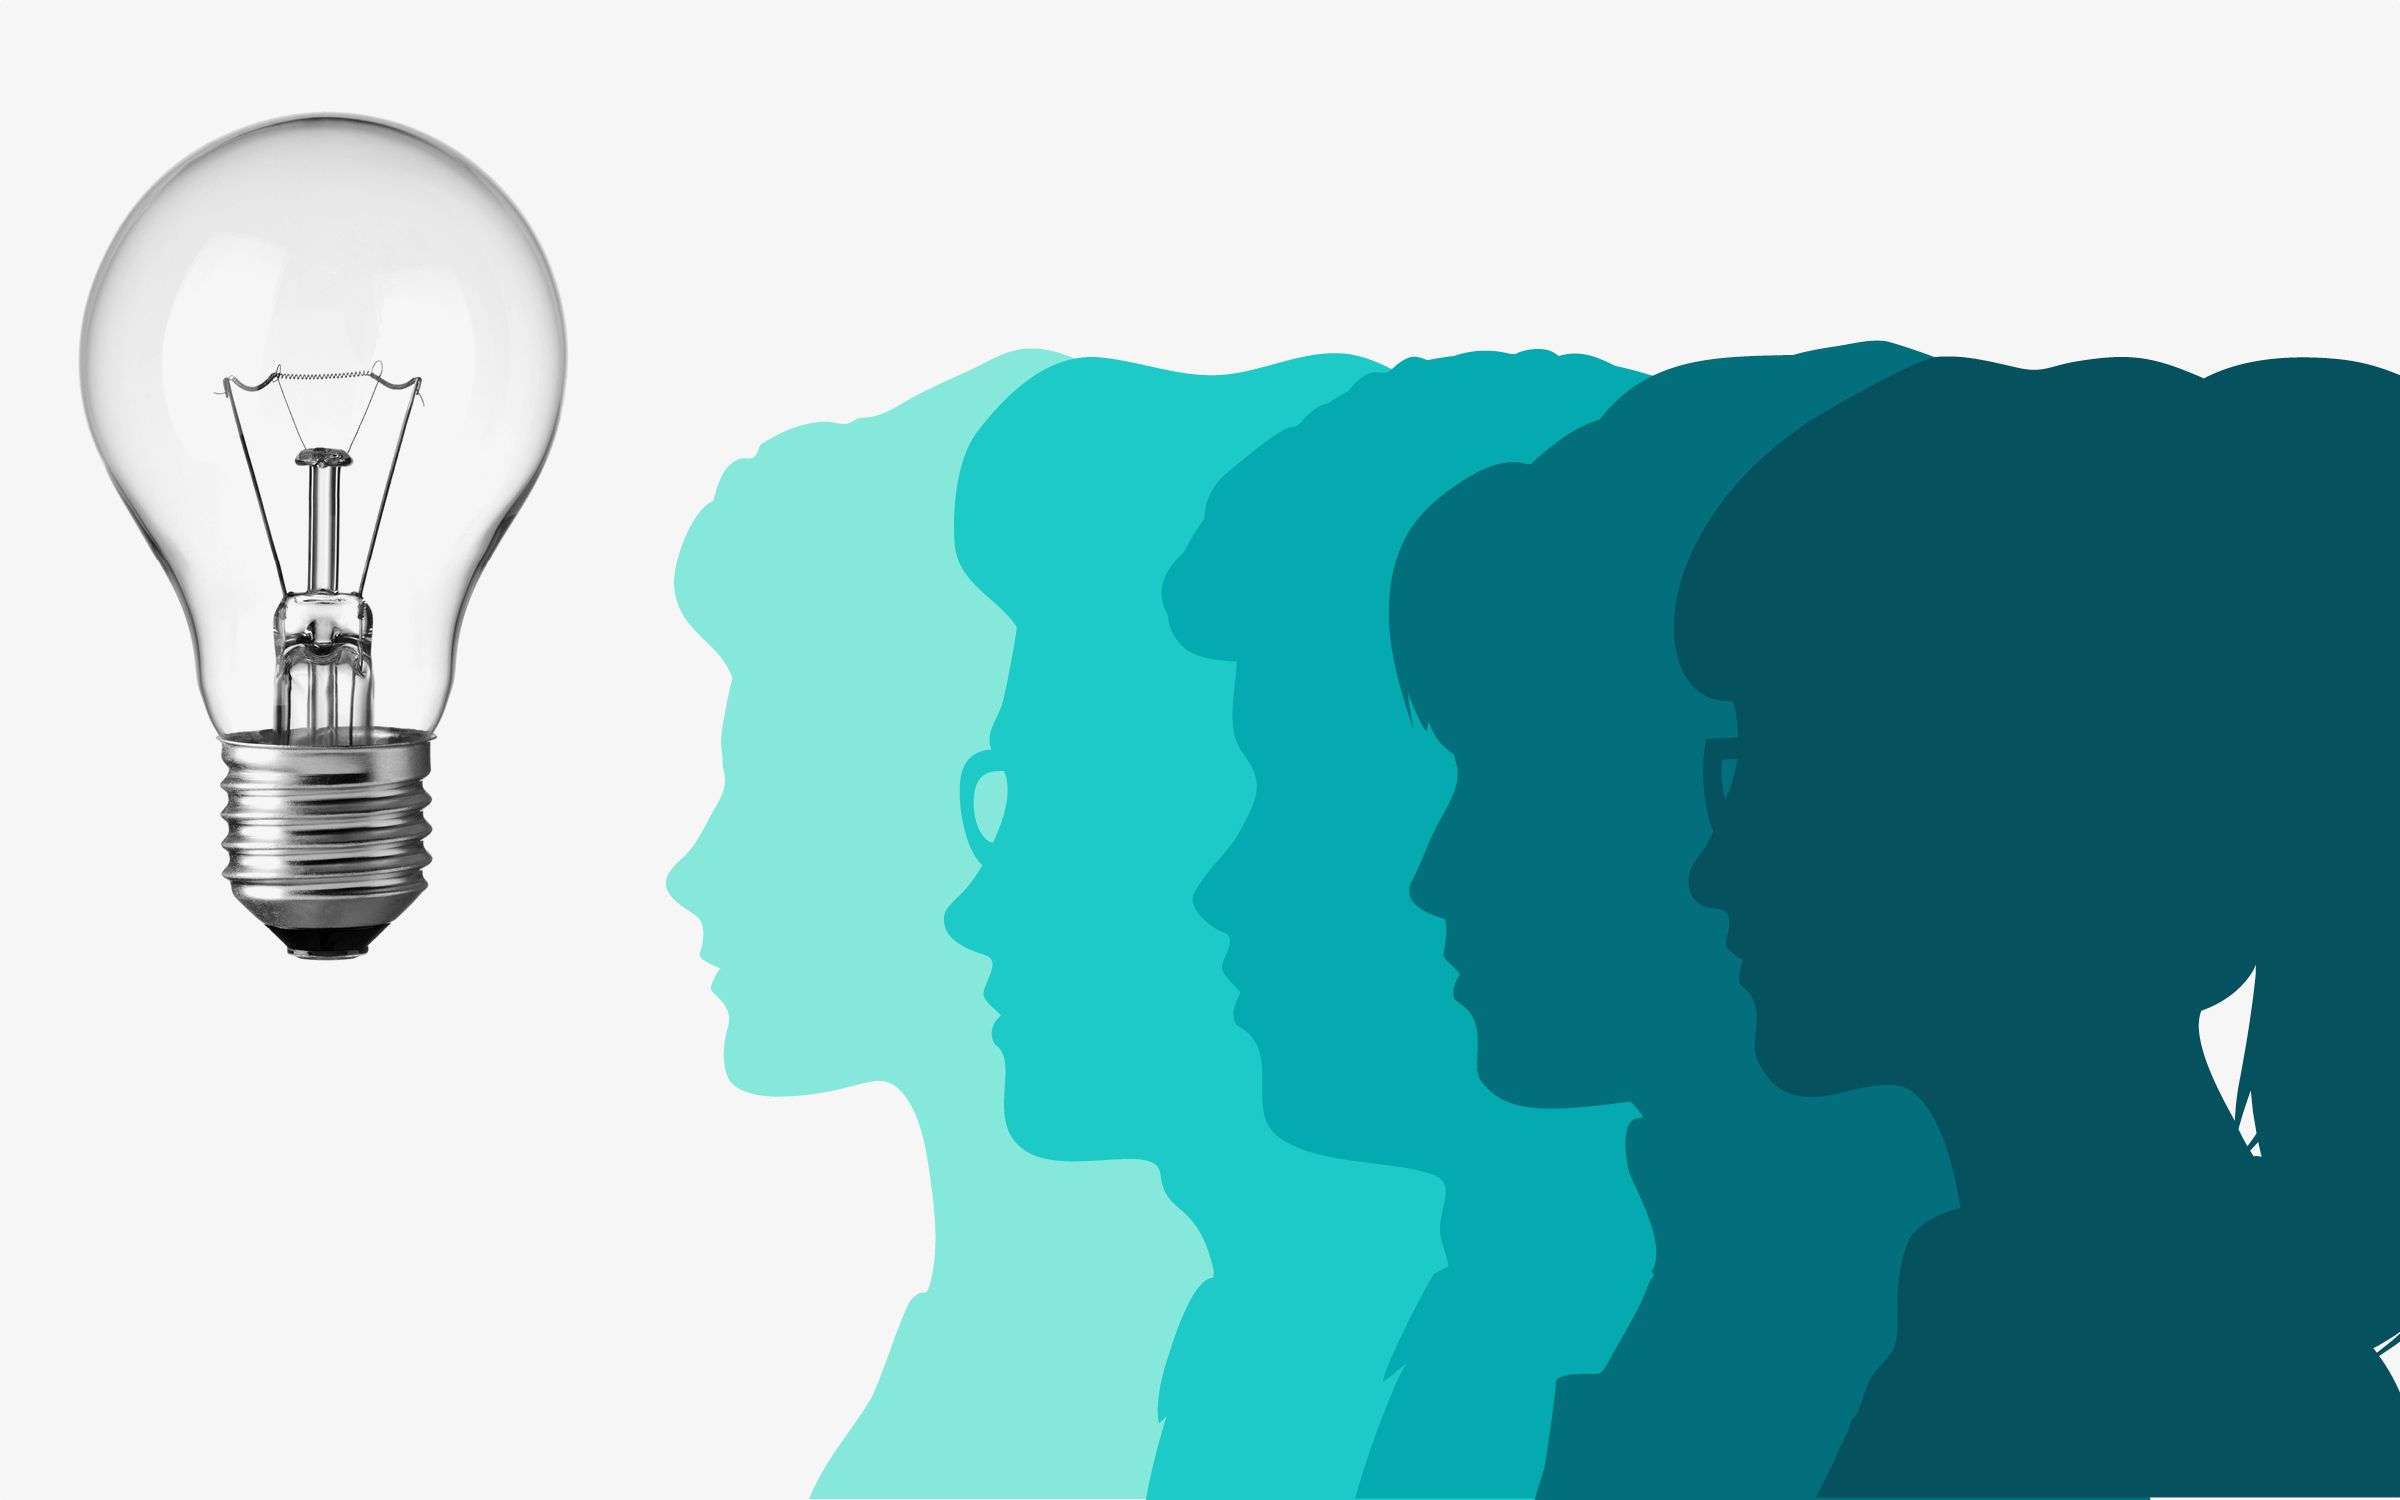 Remote Collaboration & Brainstorming in Design